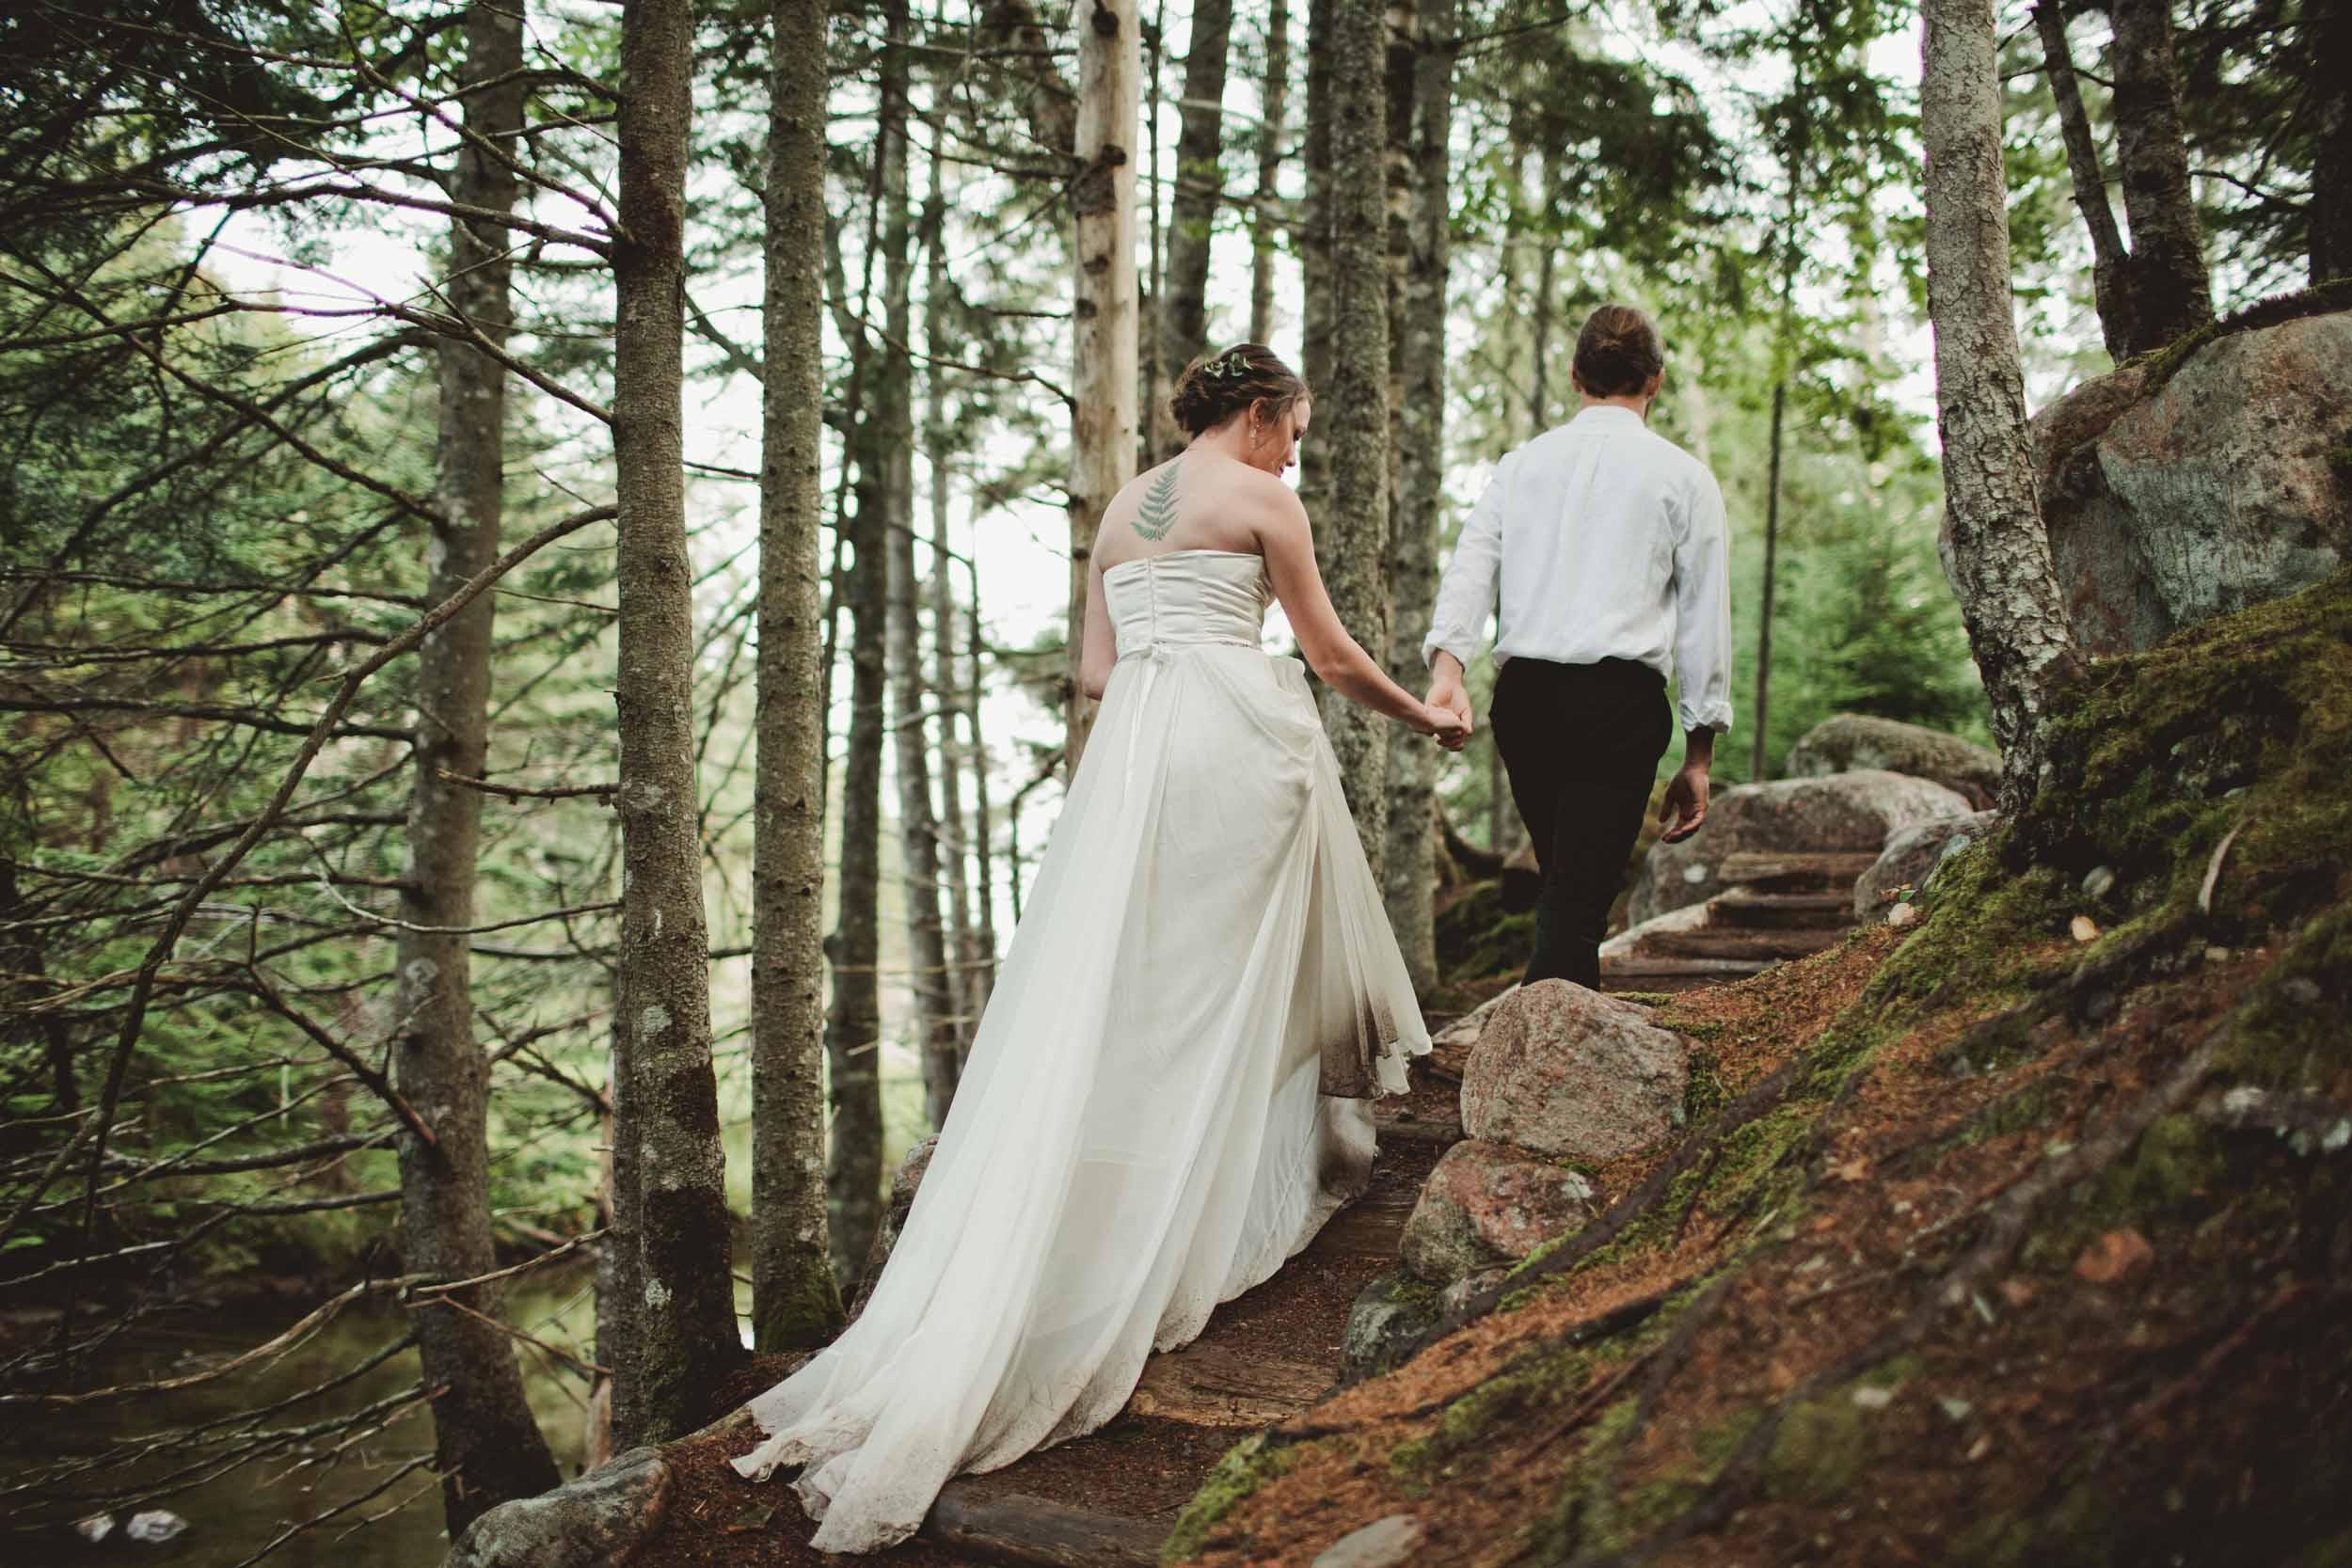 Maine-Elopement-Photographer29.jpg